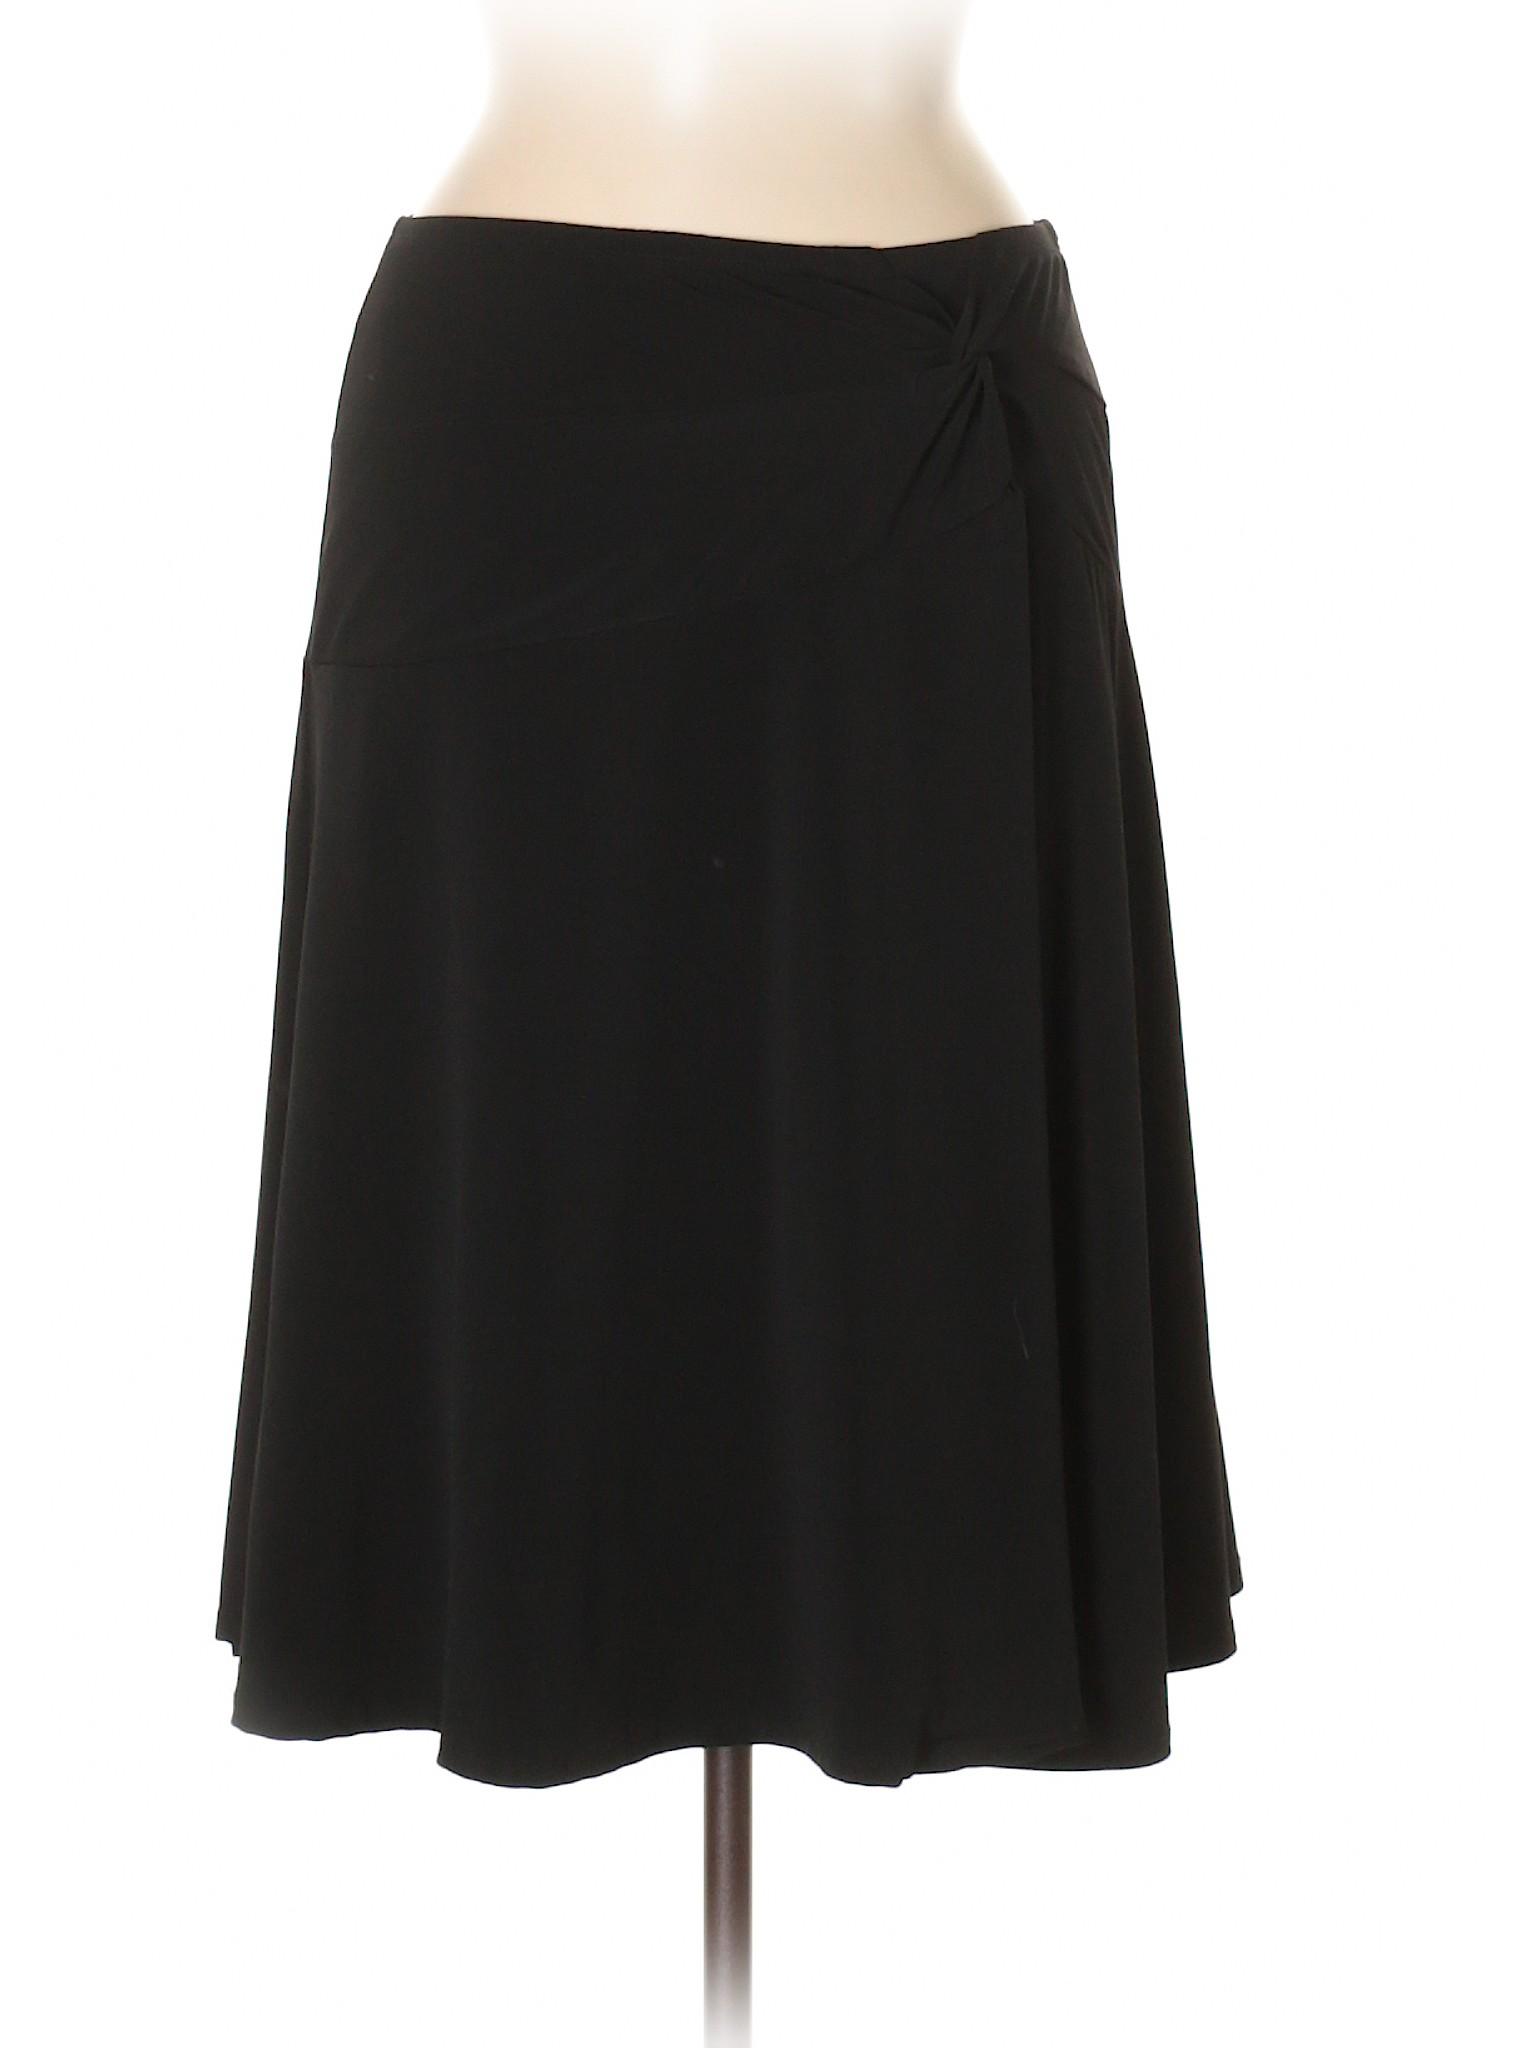 Boutique Casual Boutique Skirt Casual Boutique Boutique Casual Casual Casual Boutique Skirt Skirt Skirt q5BxwCCd